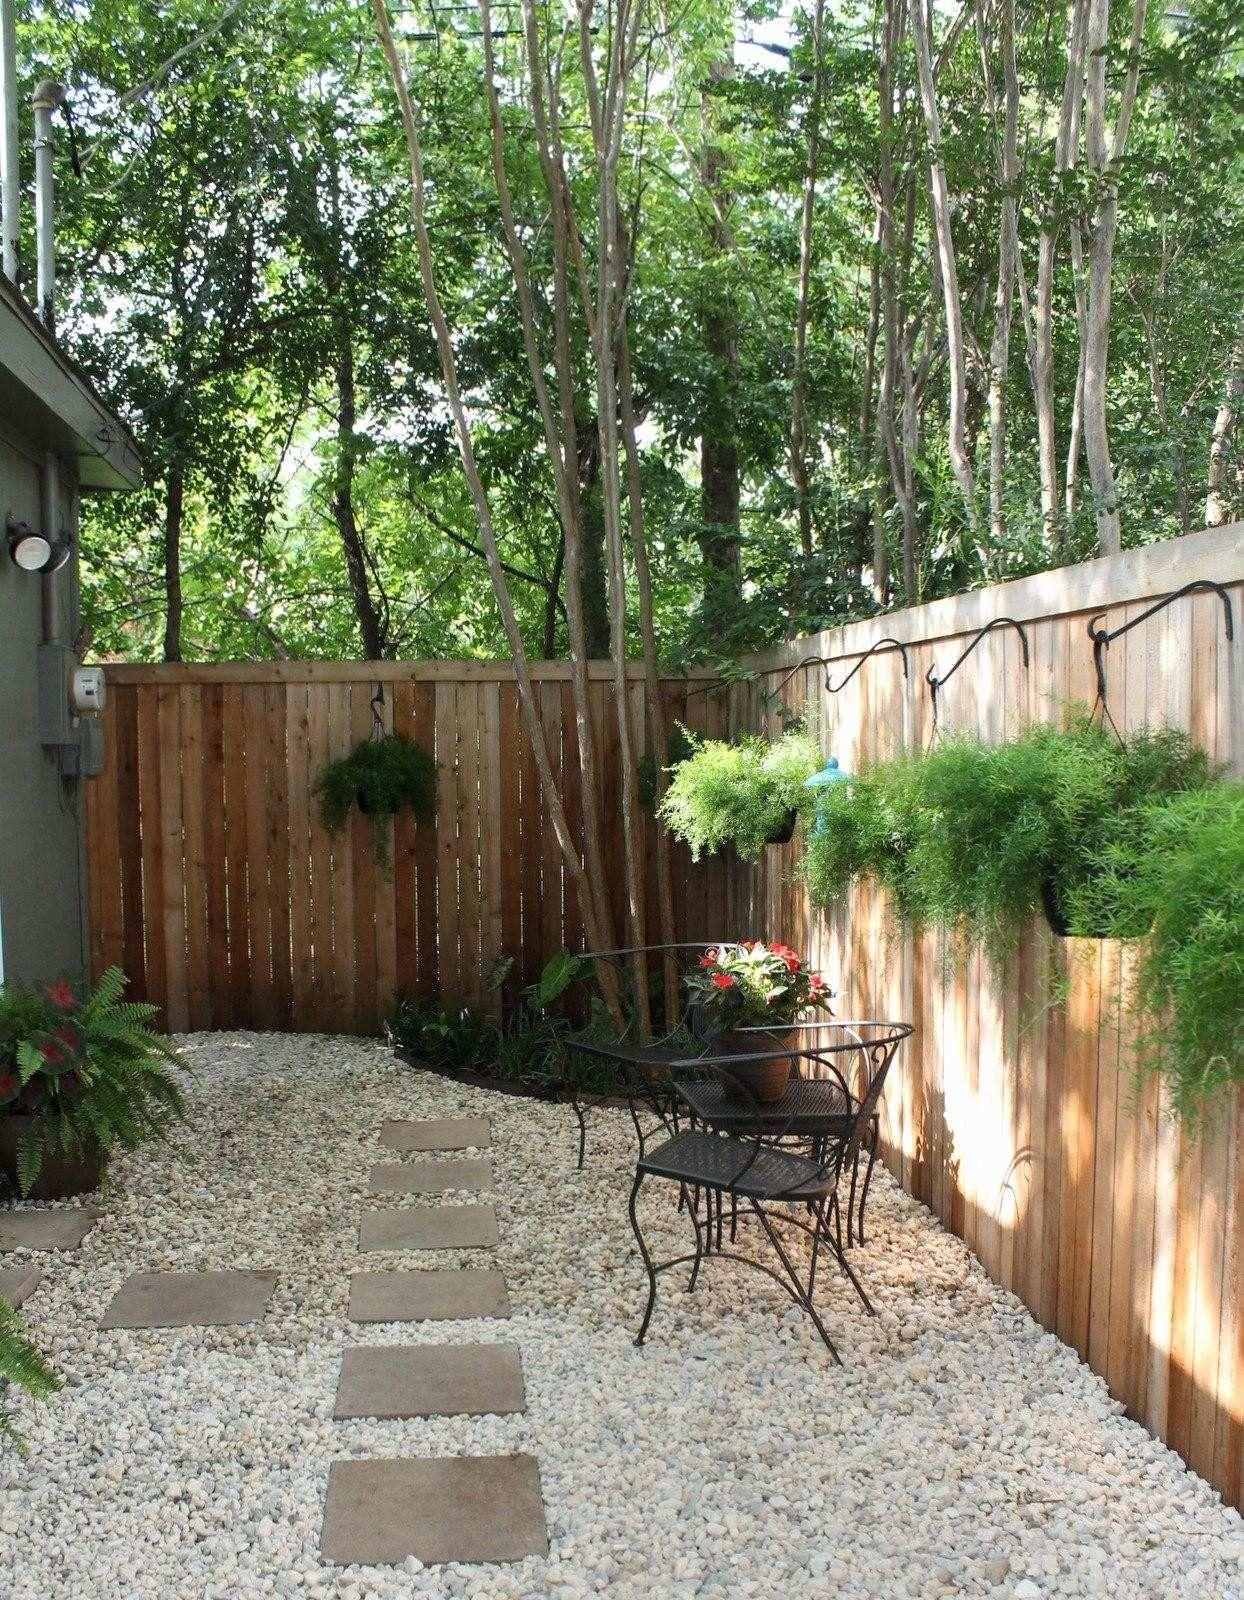 Formidable Backyard Ideas No Grass | Large backyard ... on Cheap No Grass Backyard Ideas  id=45357